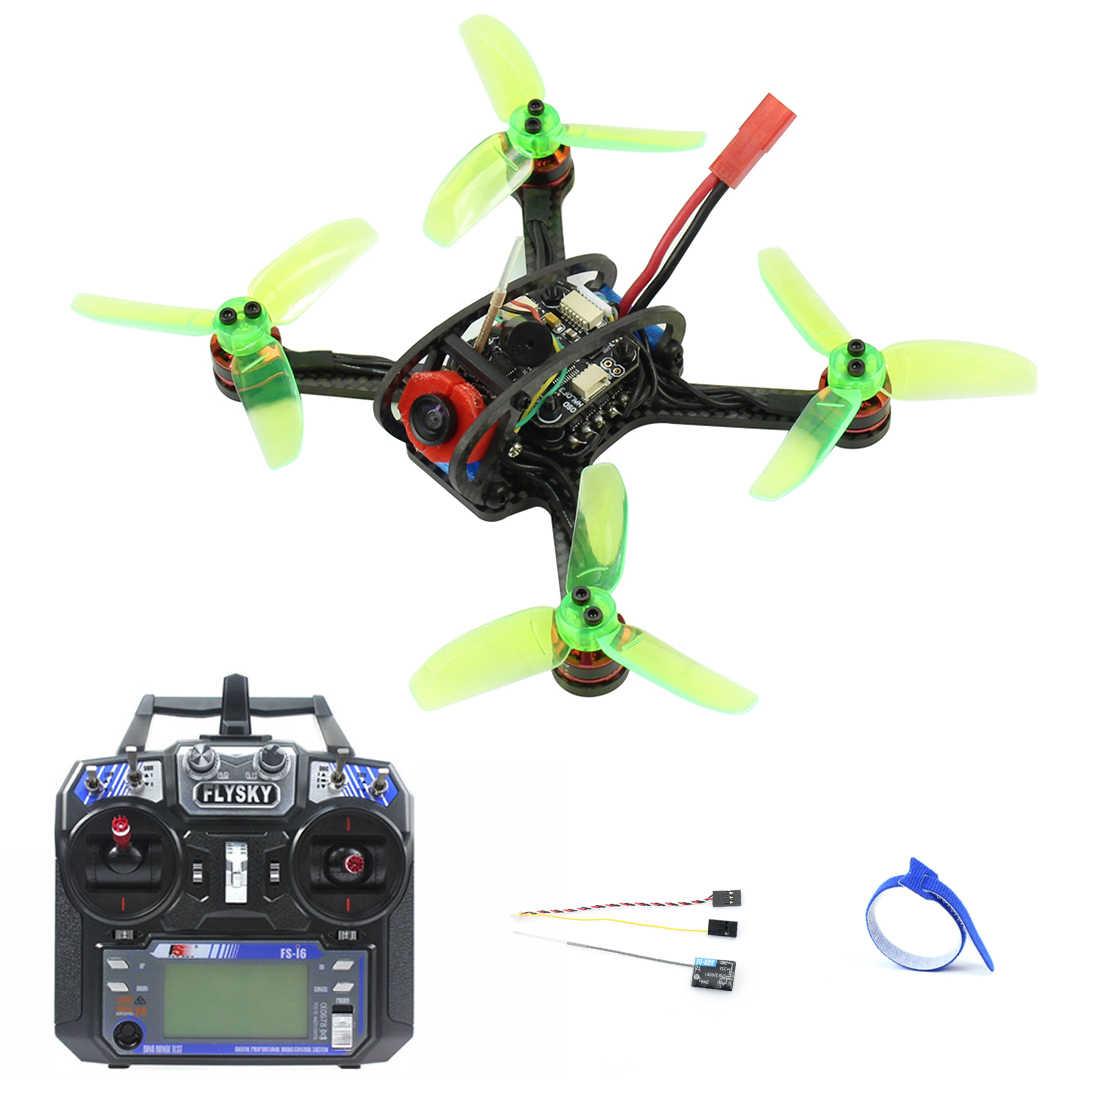 Mini F3 OSD 2S RC FPV Racing Drohne Quadcopter 700TVL Kamera VTX Goggle 10A